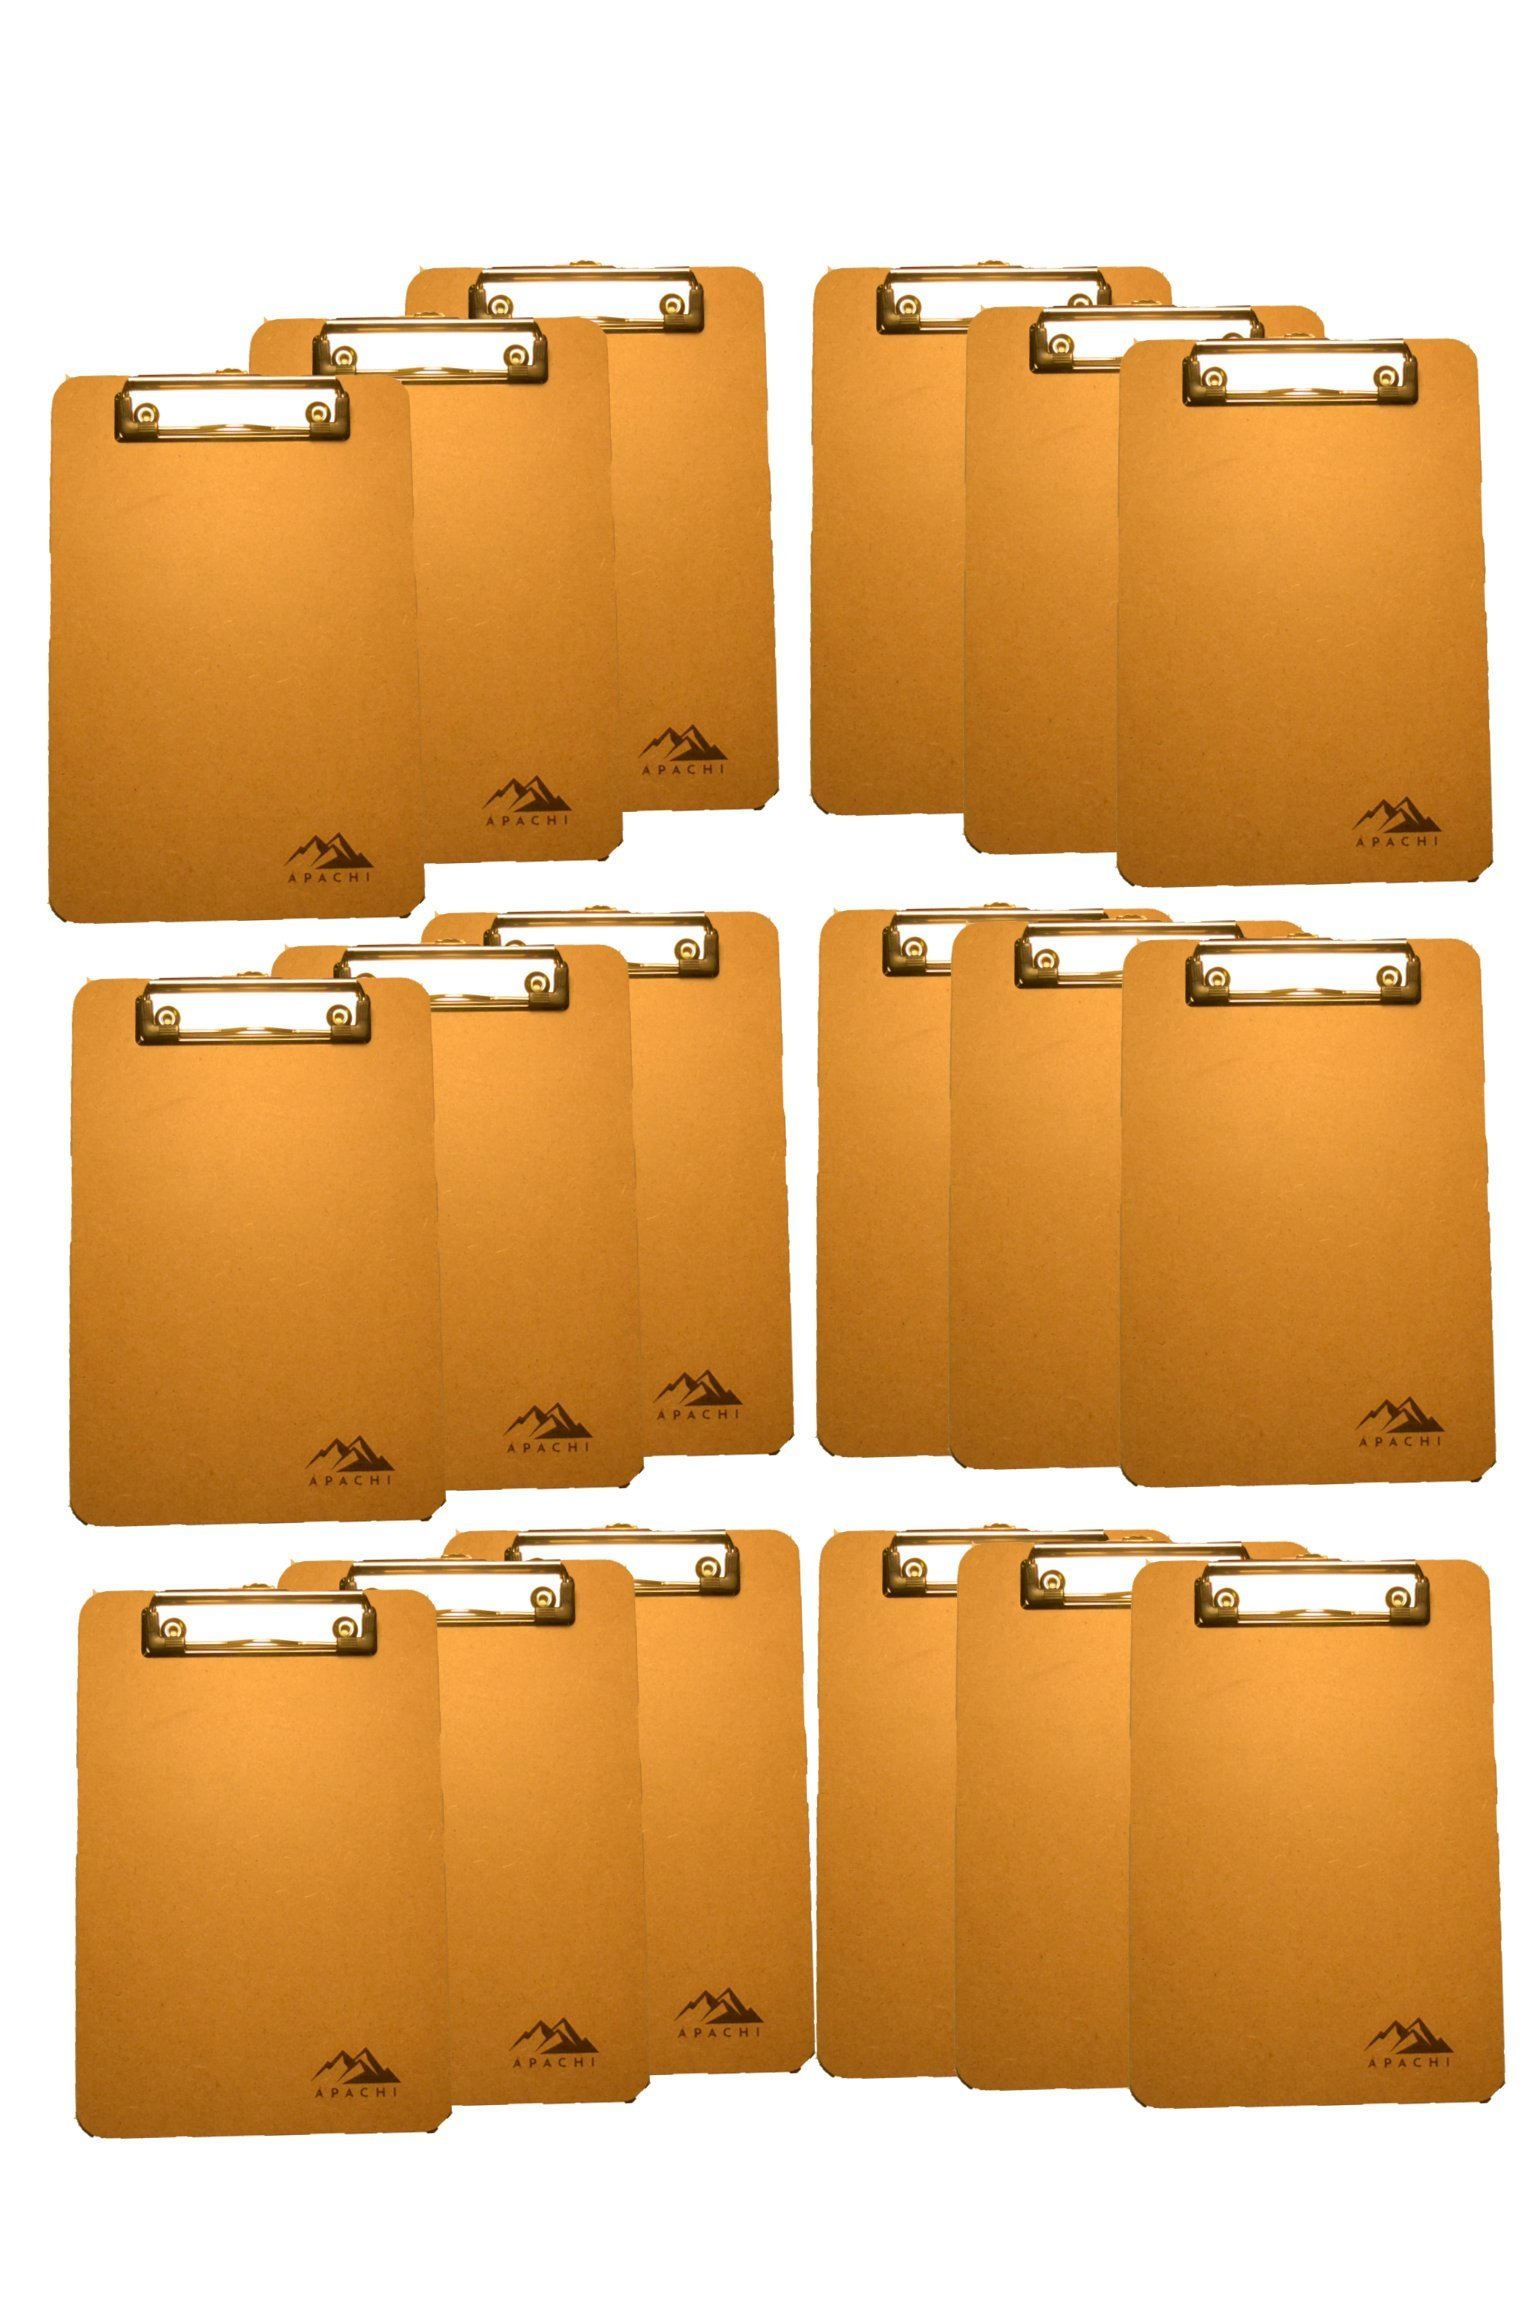 Apachi Mini Clipboards (6''x9'') 18 Pack/Memo clipboards